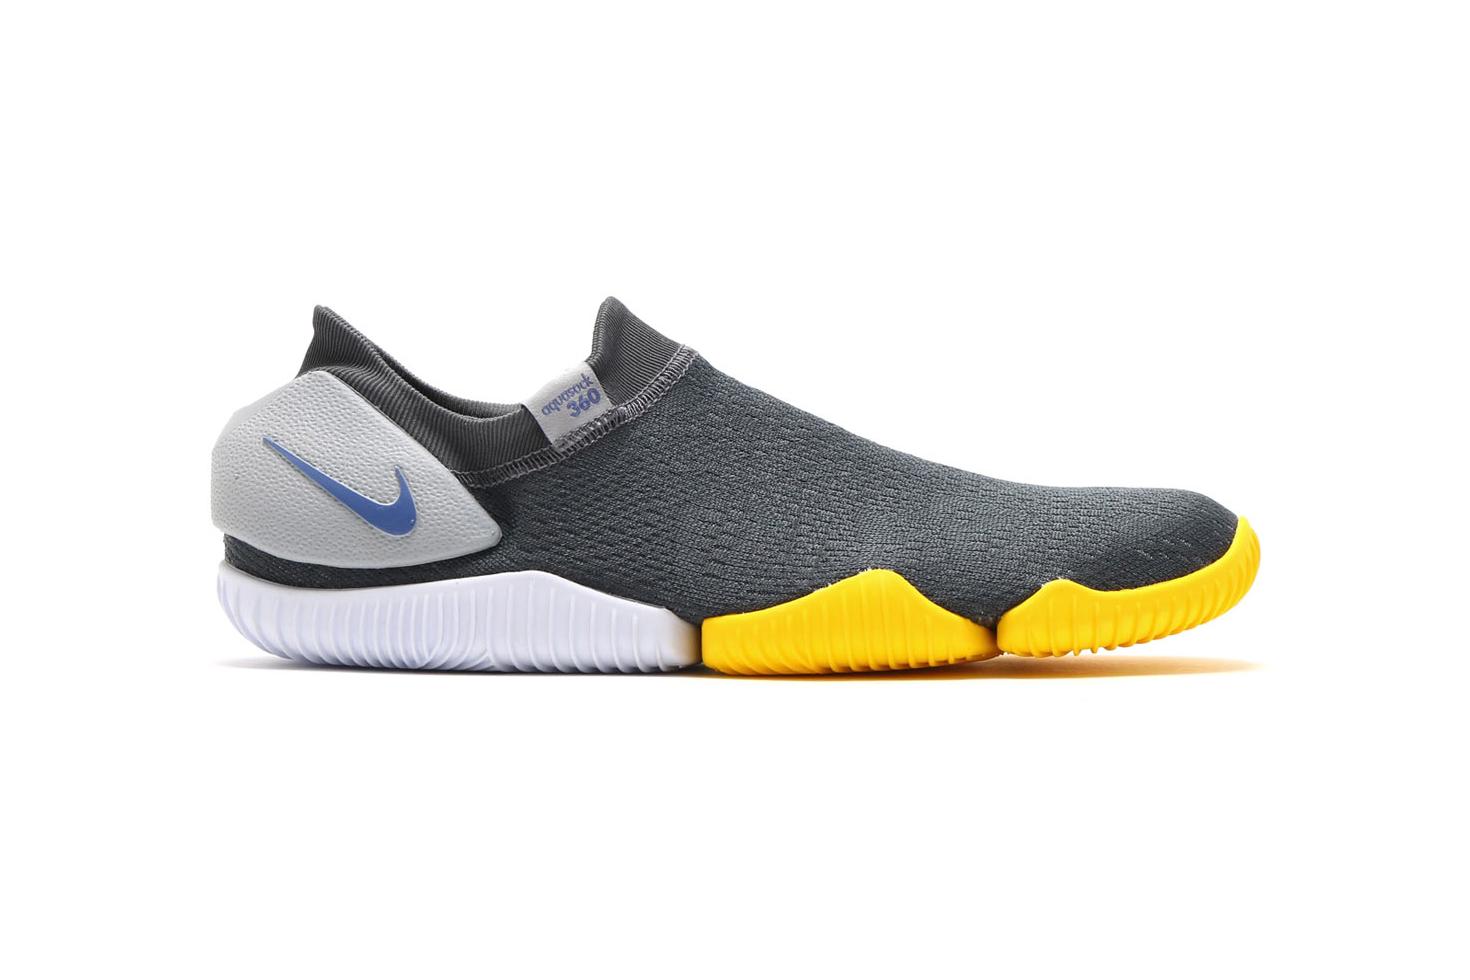 nike-aqua-sock-360-2.jpg?quality=95&w=17